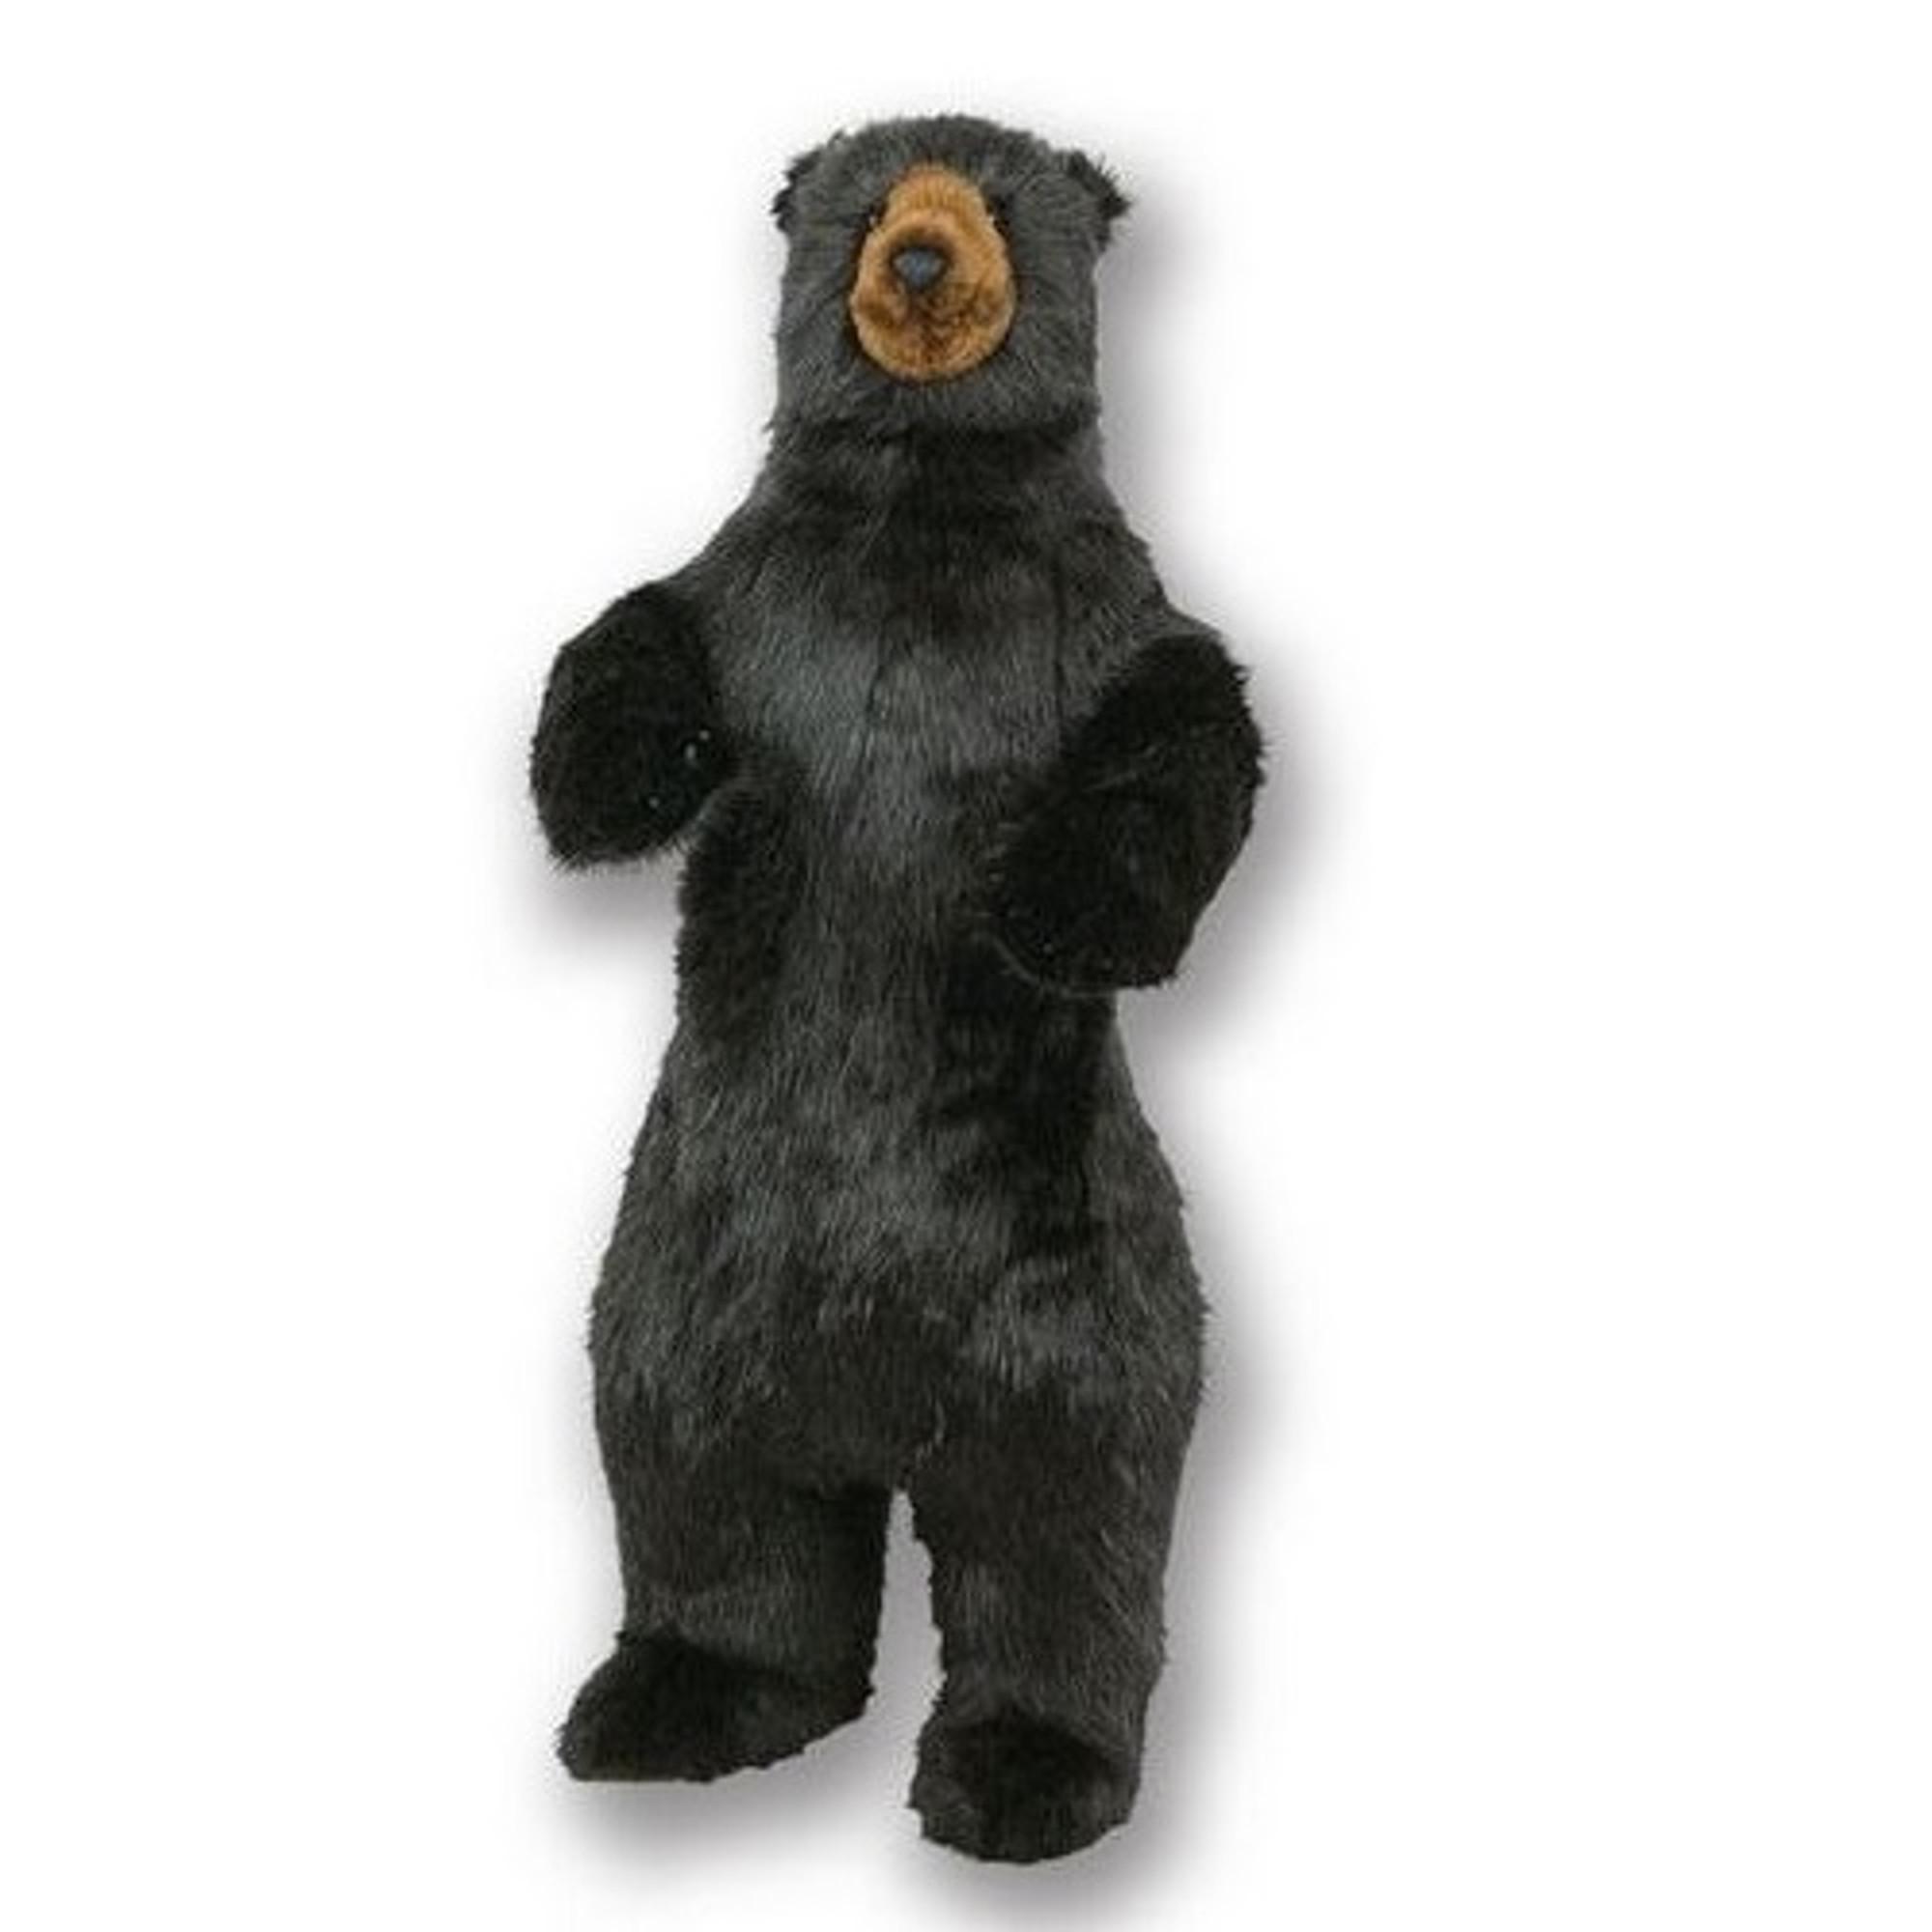 Sunbear Stuffed Animal, Black Bear Standing Plush Stuffed Animal Life Size Ditz Designs